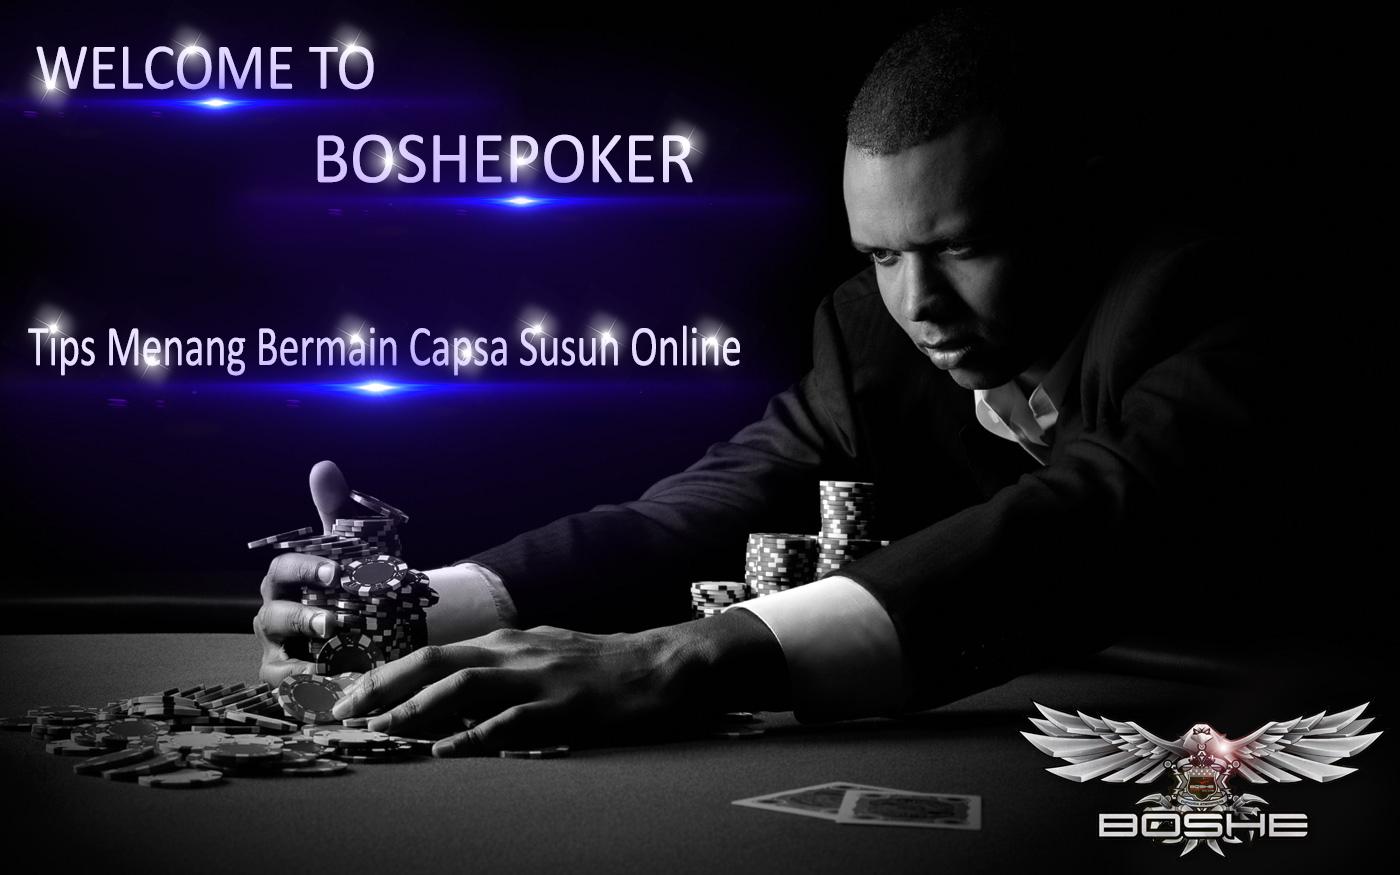 Kakek Nenek Poker Pkv Games Online Boya Yg Benar Sepadan Sanggup Jadi Ahli Career Care